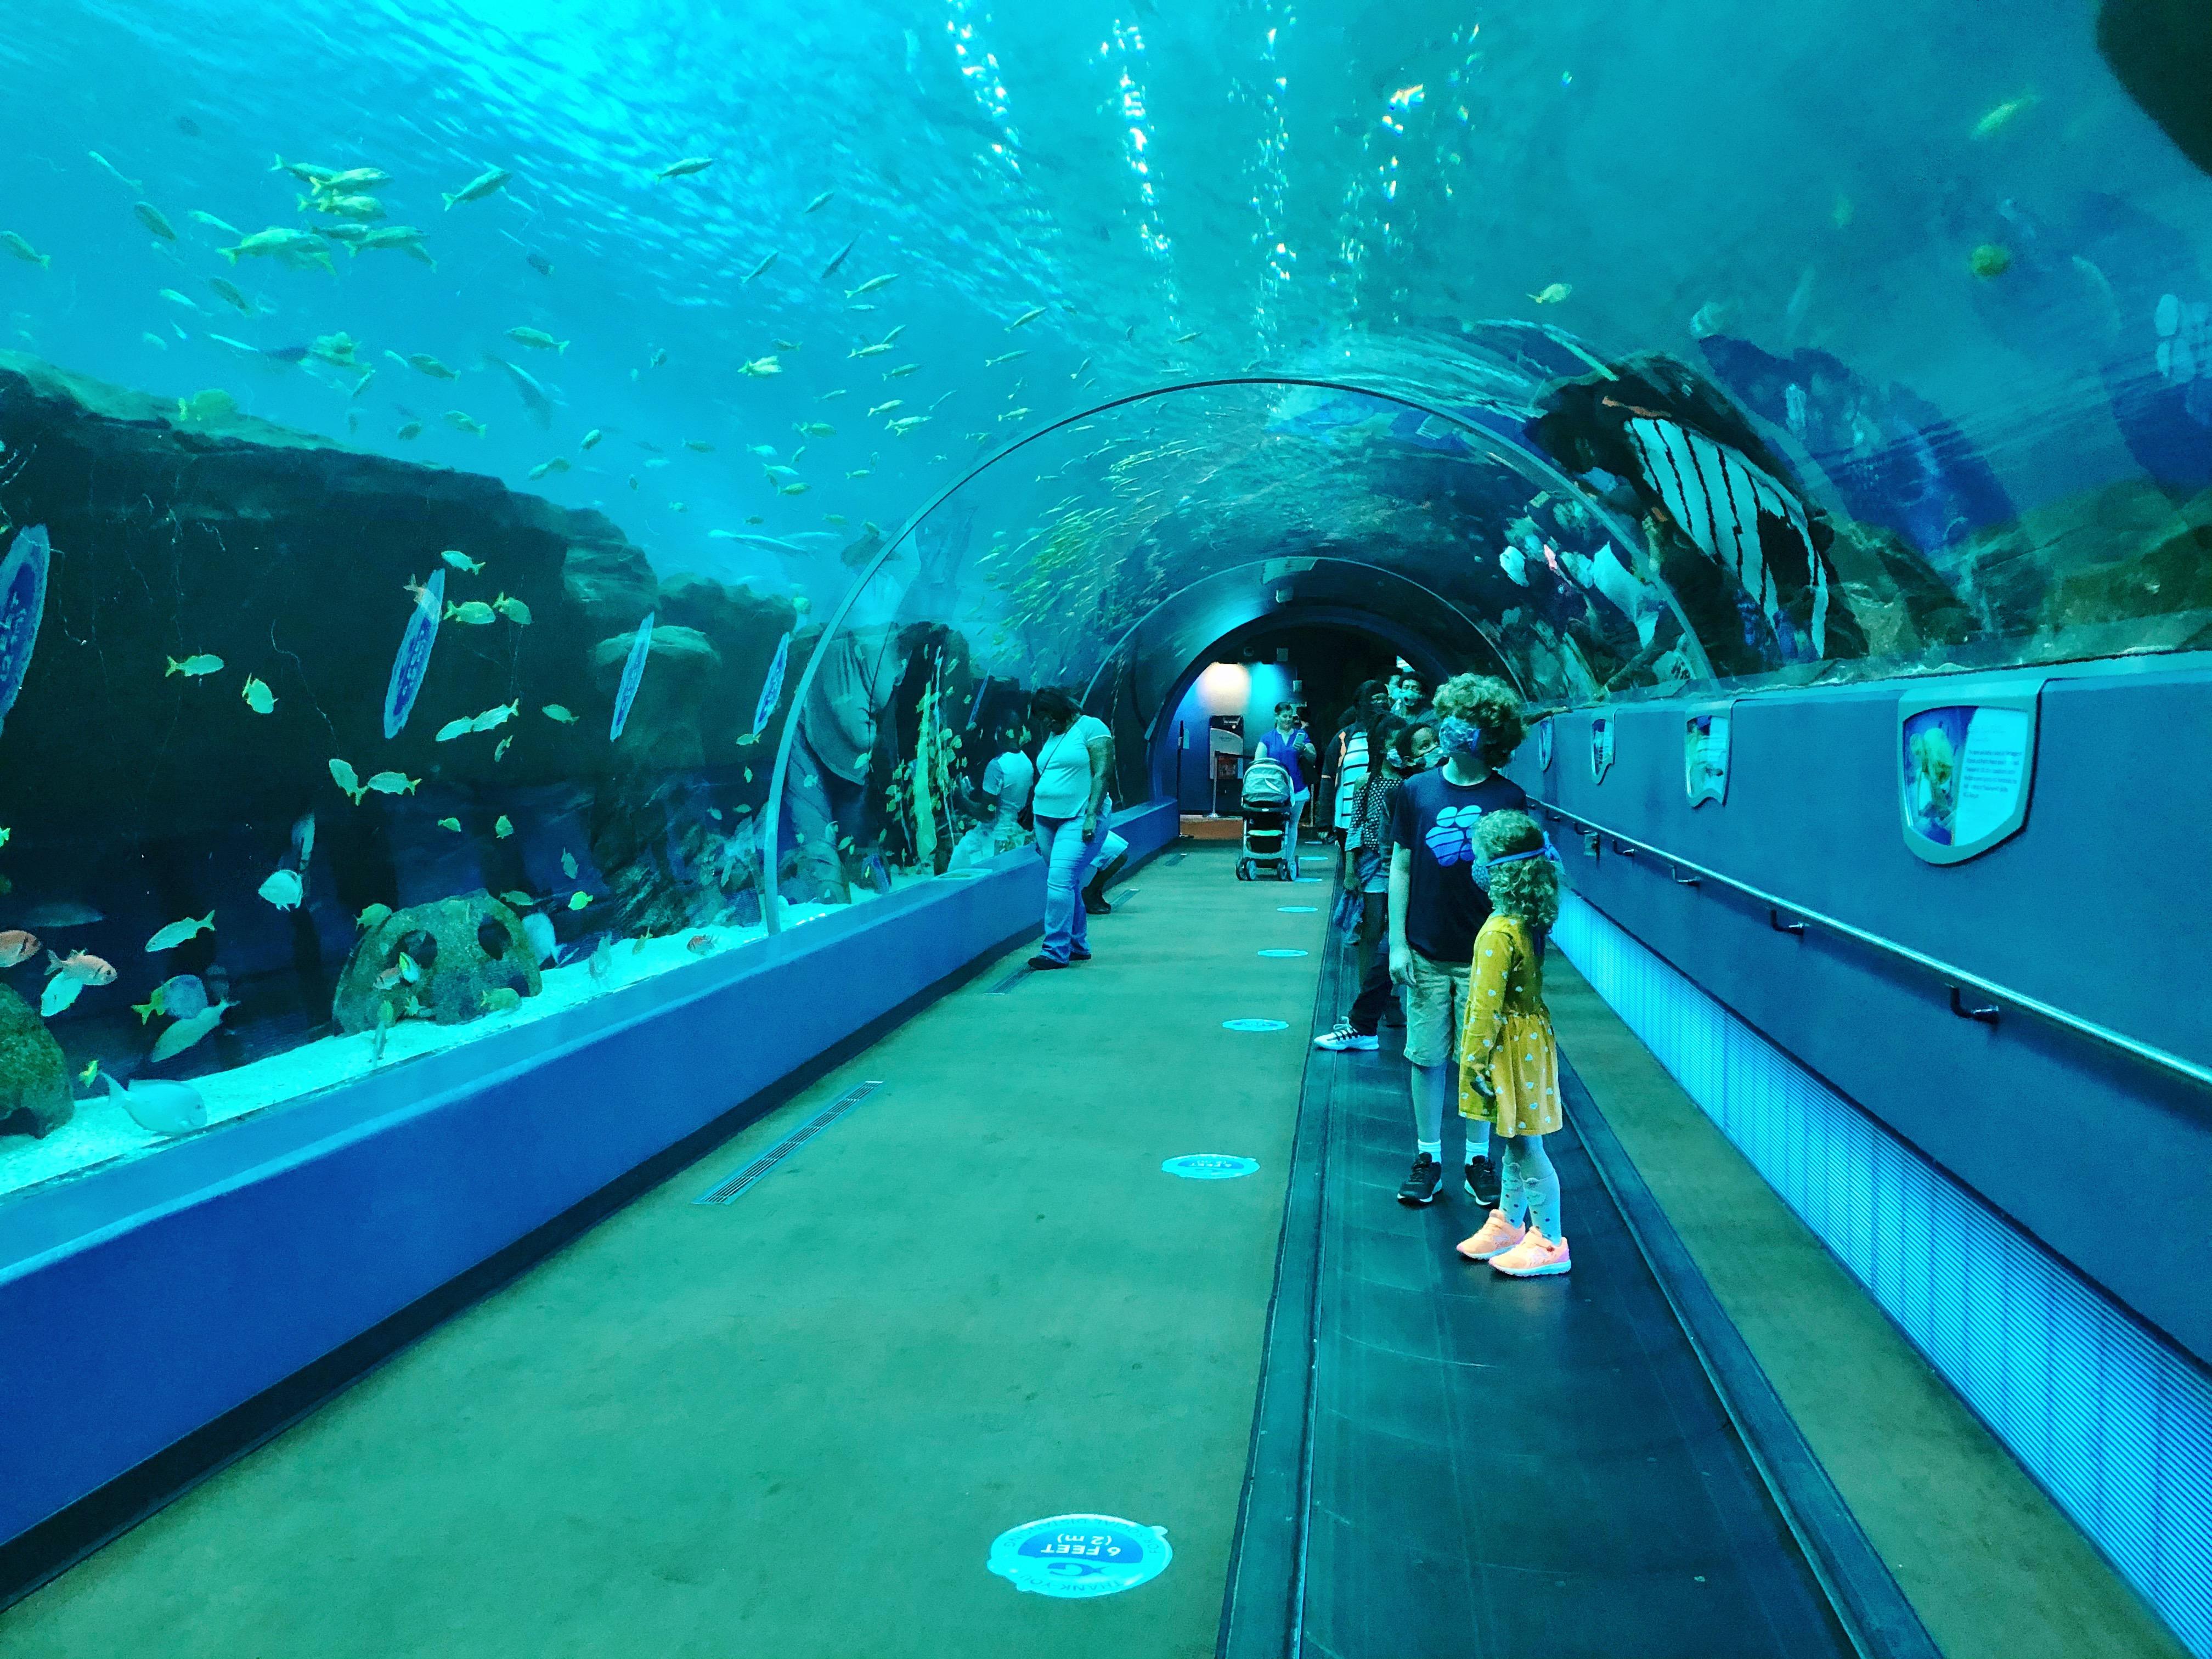 Save on Atlanta Experiences with CityPASS - Georgia Aquarium & More